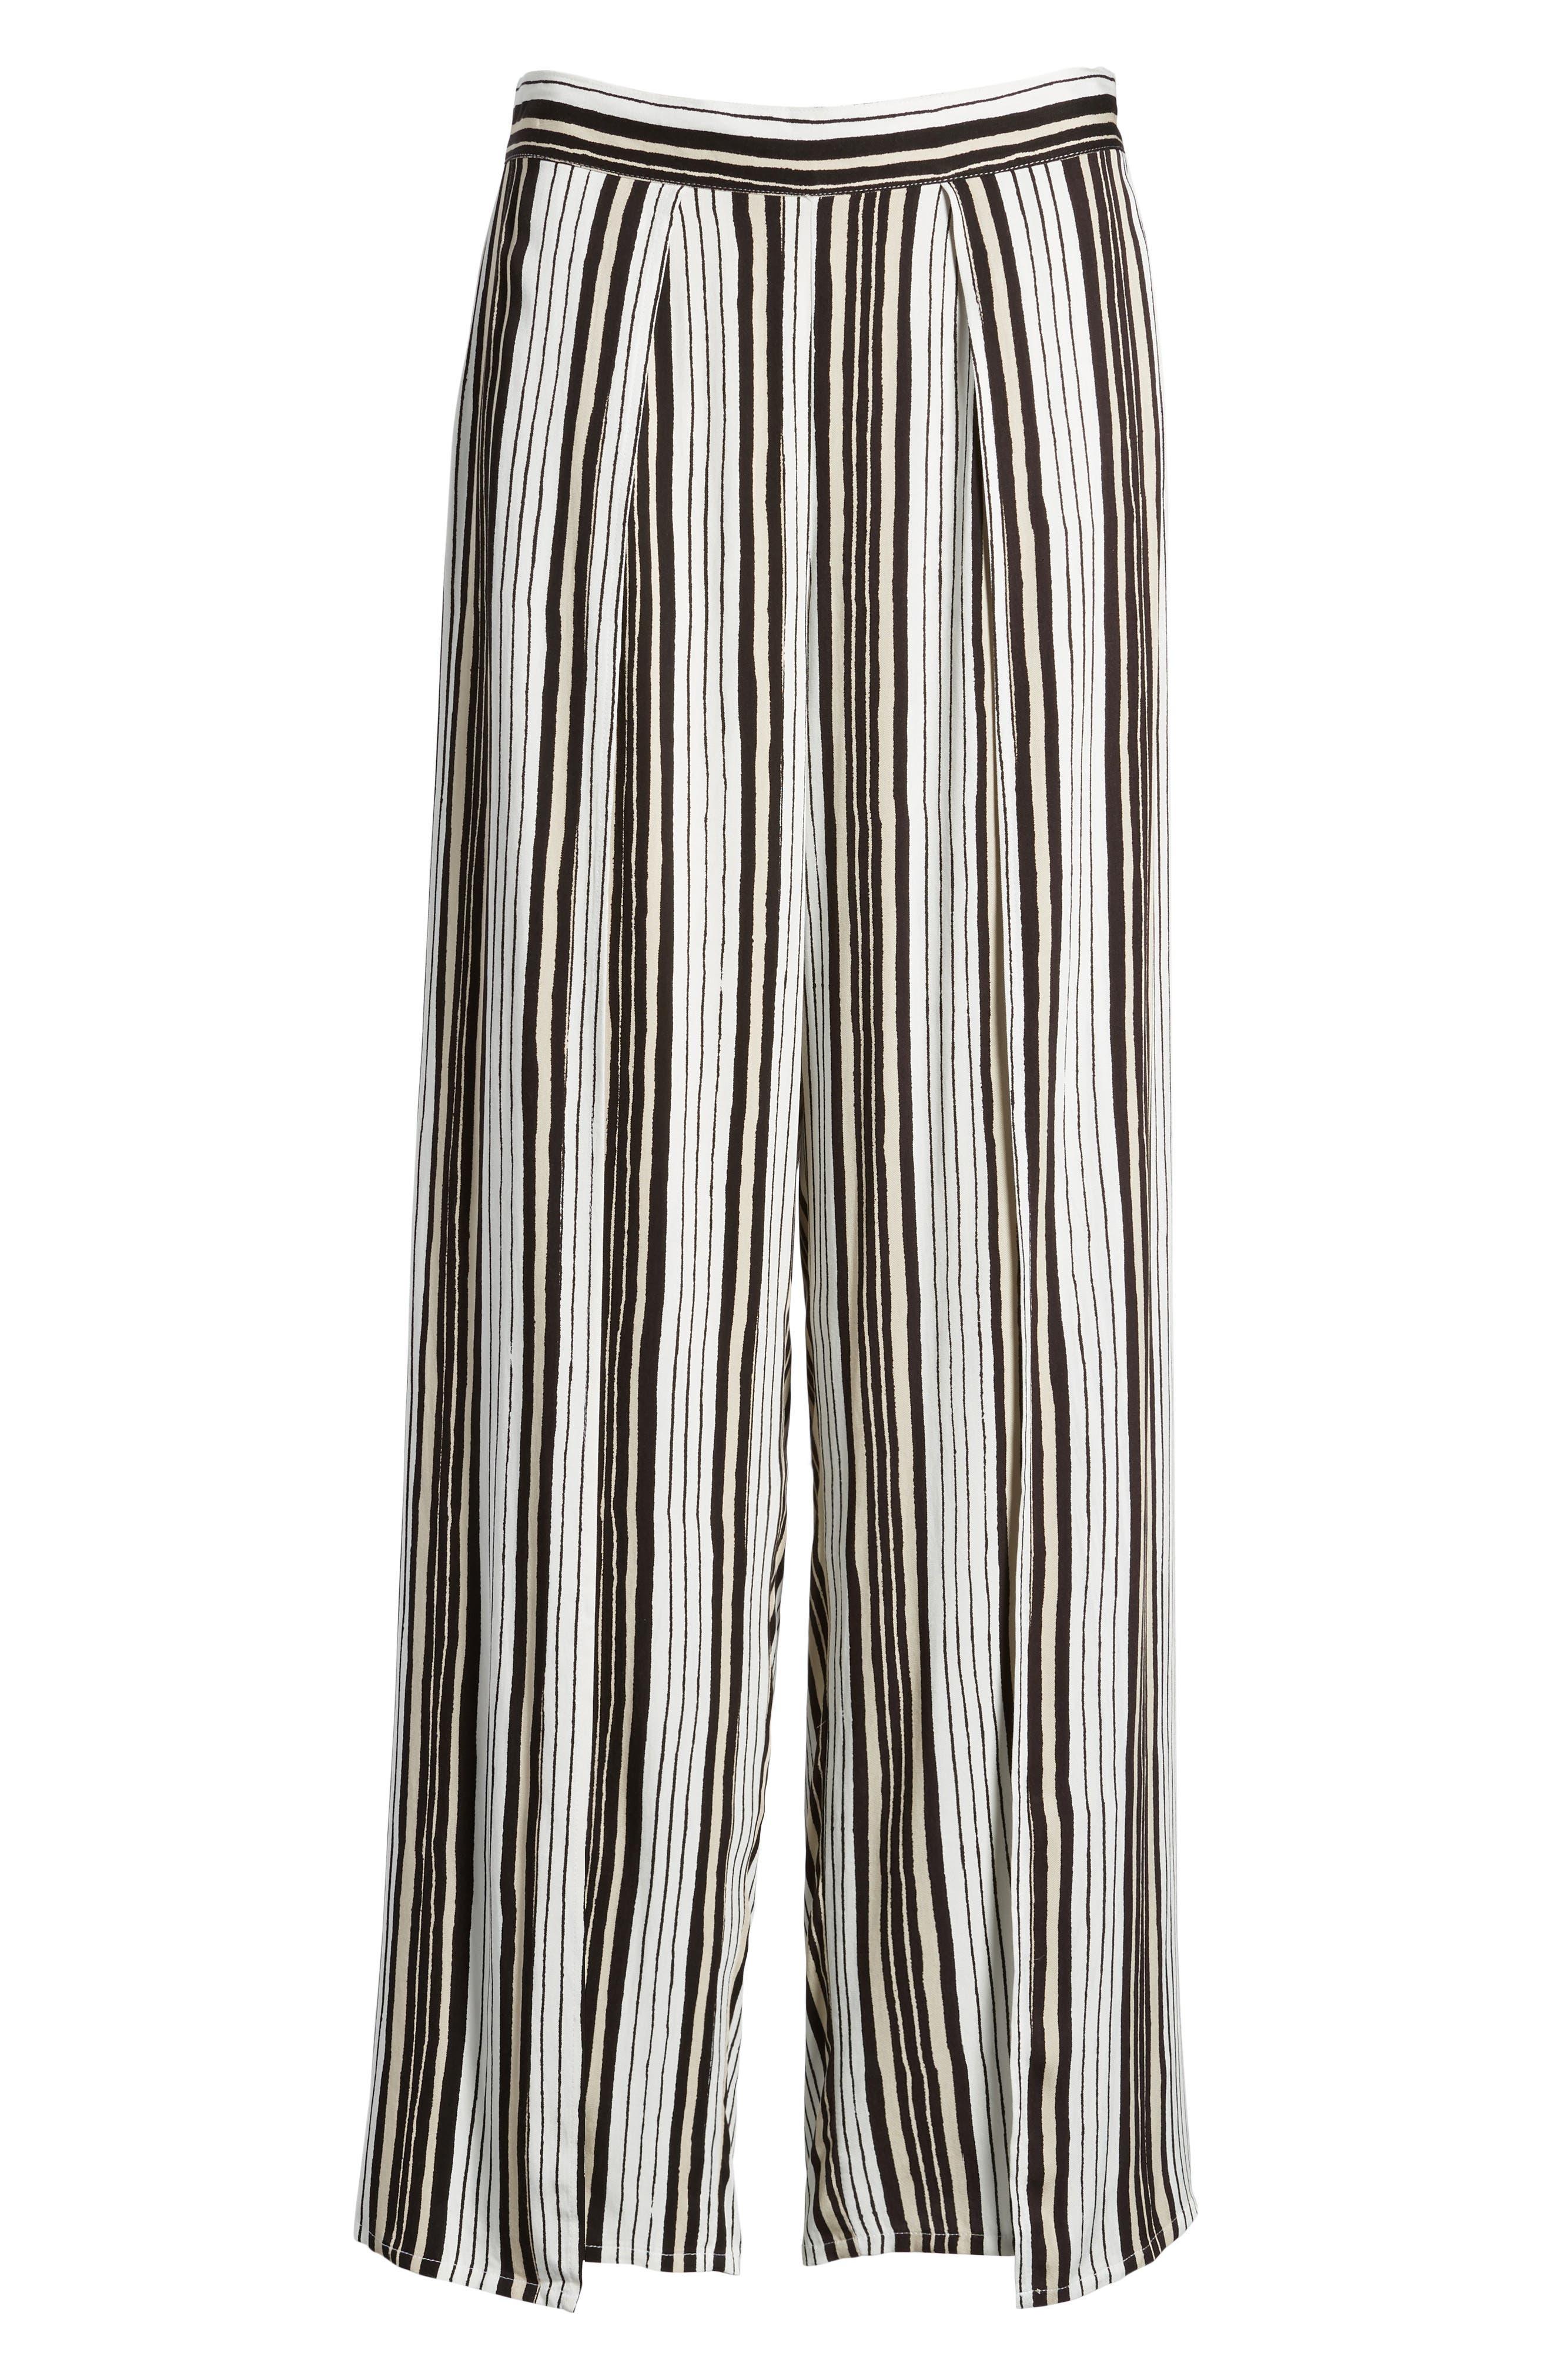 Avah Stripe Pants,                             Alternate thumbnail 6, color,                             Ivory